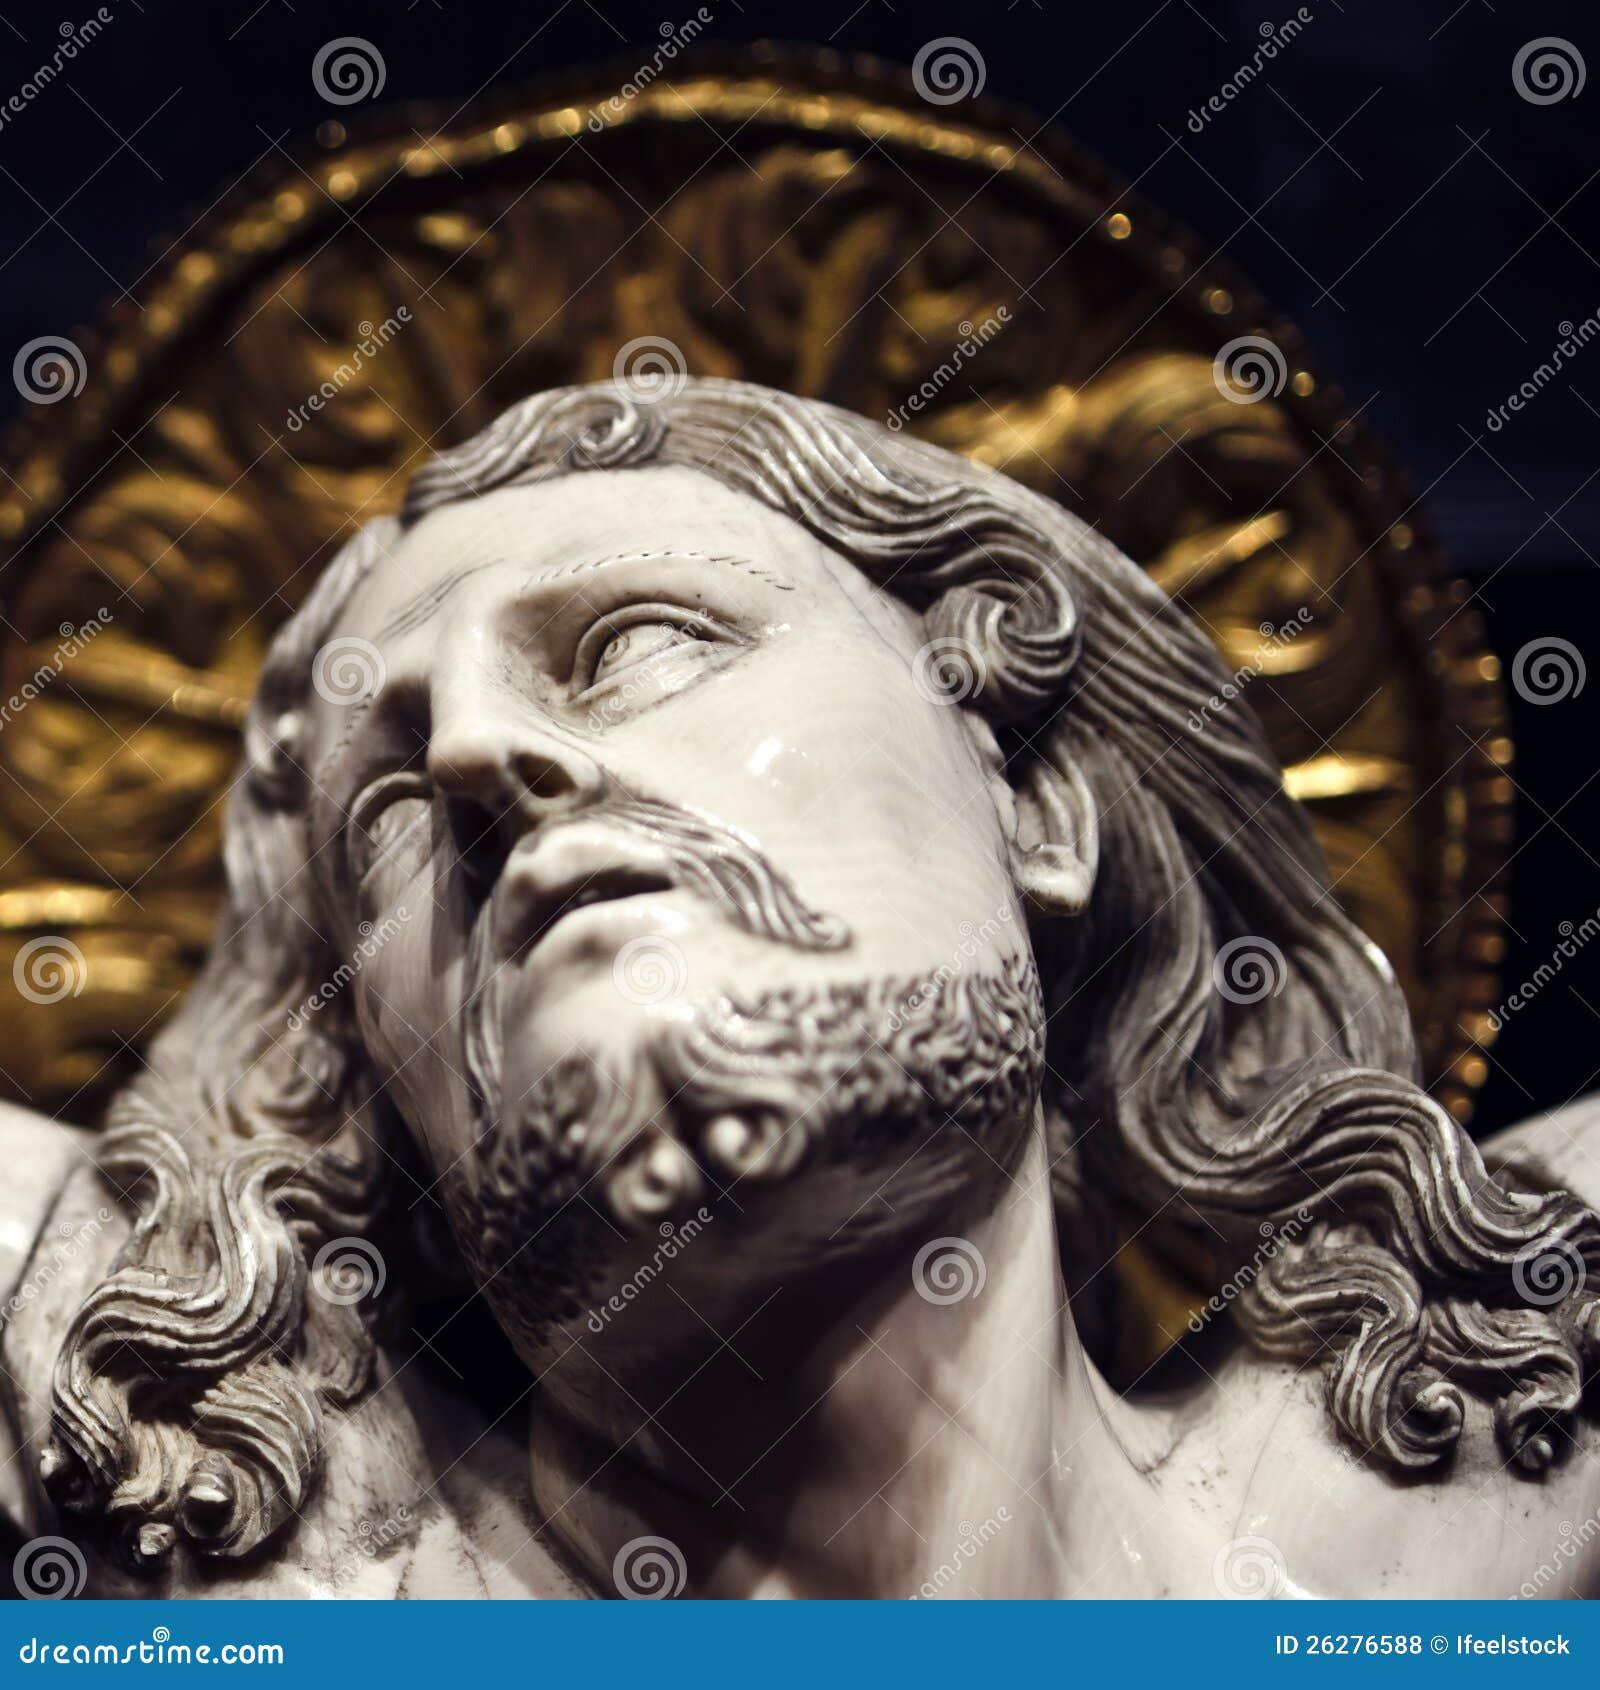 crucifixion of jesus christ royalty free stock photos image